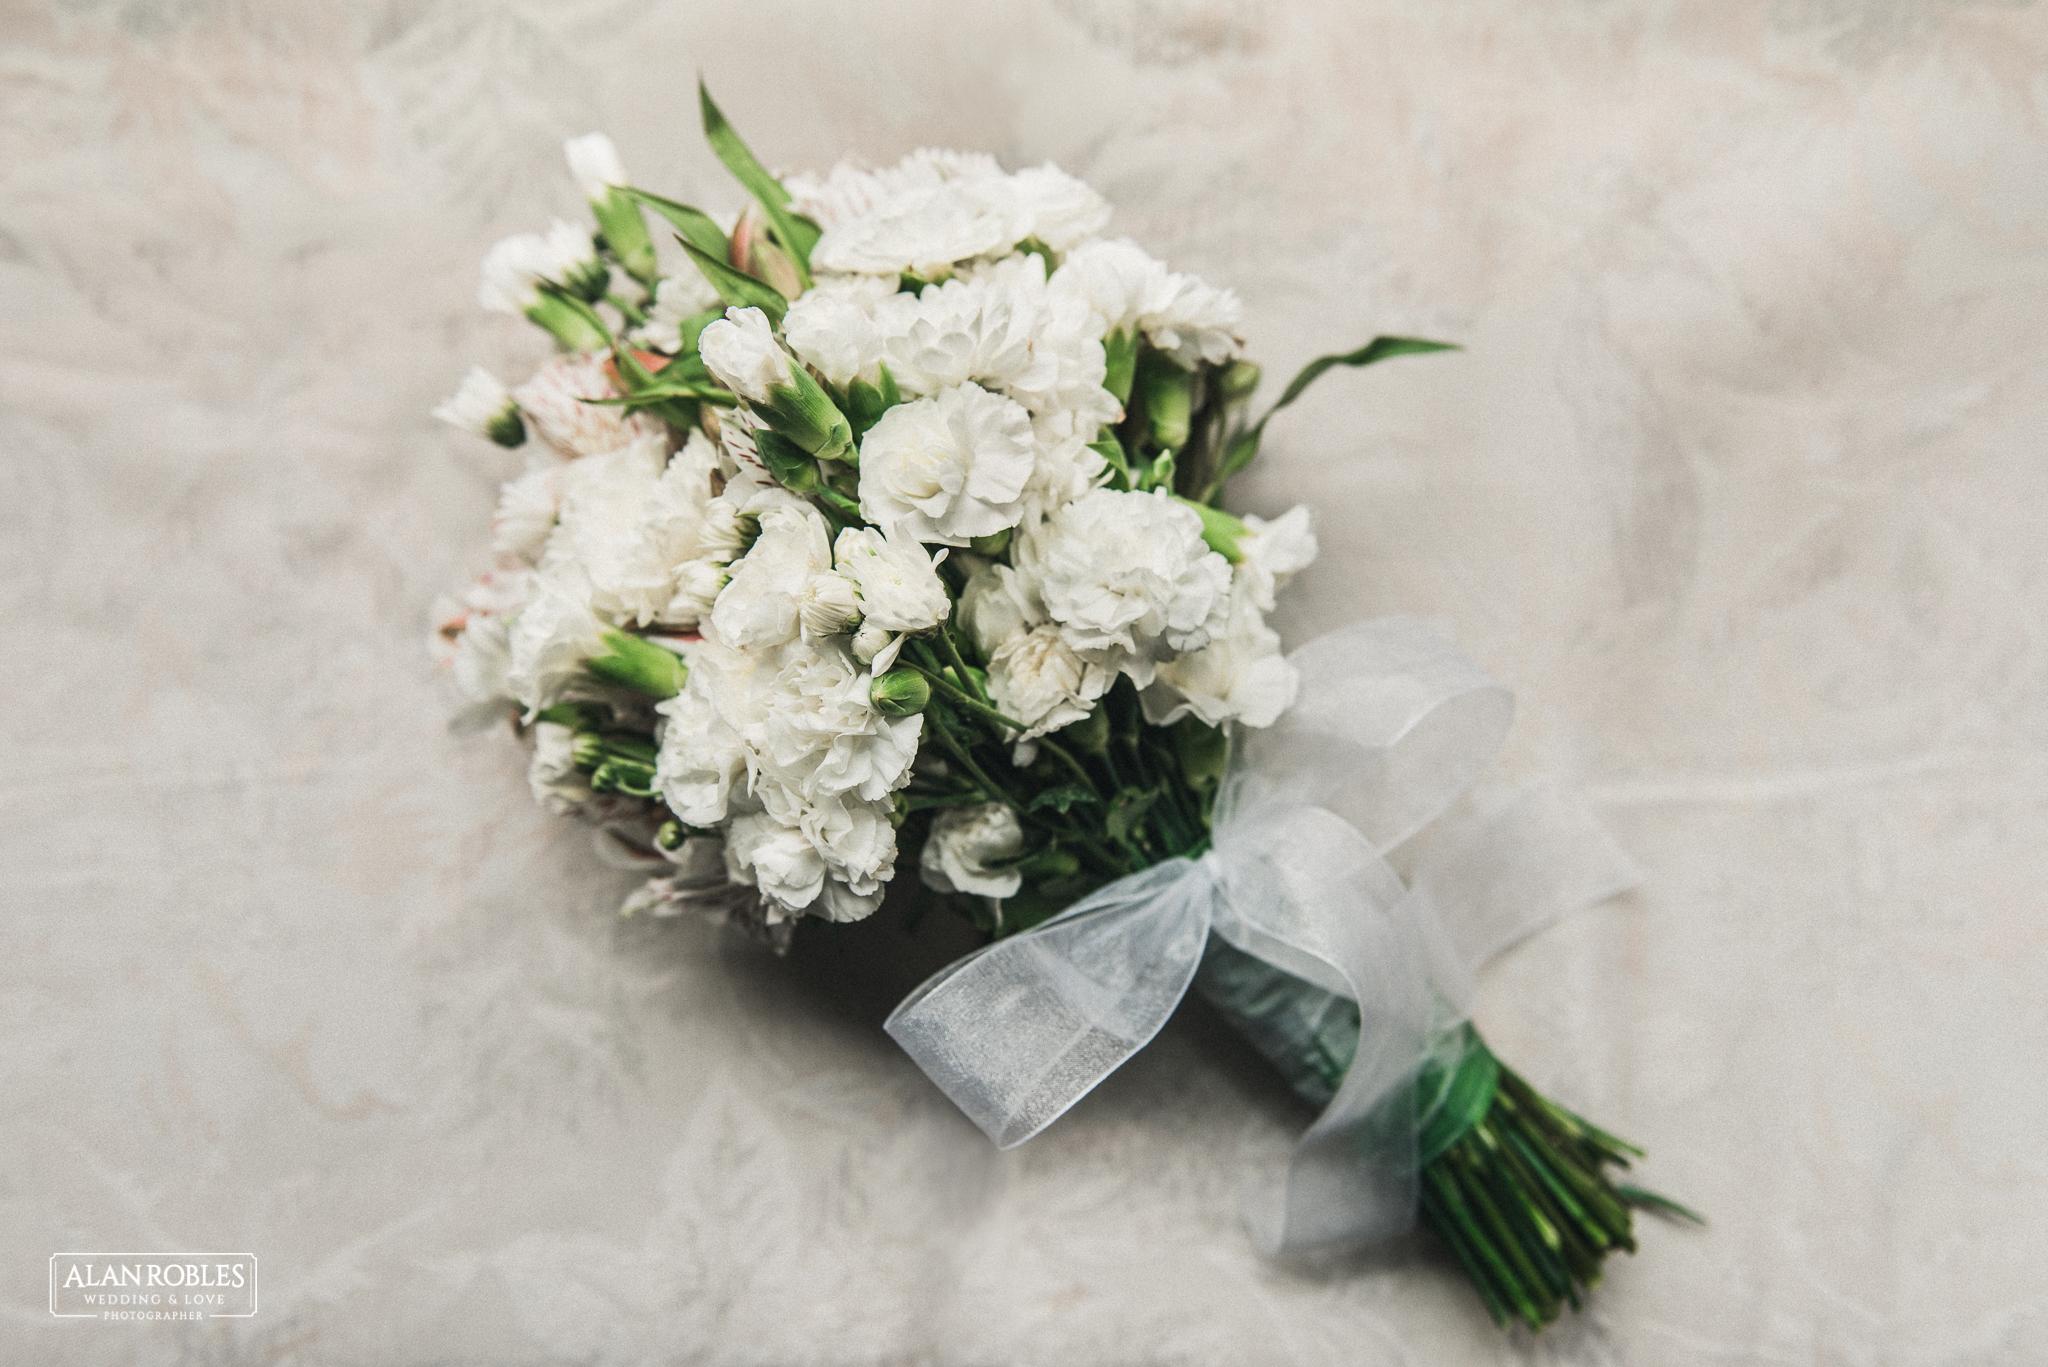 Ramo de novia, bridal bouquet. Fotografia documental de bodas. Alan Robles, fotografo de Bodas en Guadalajara.